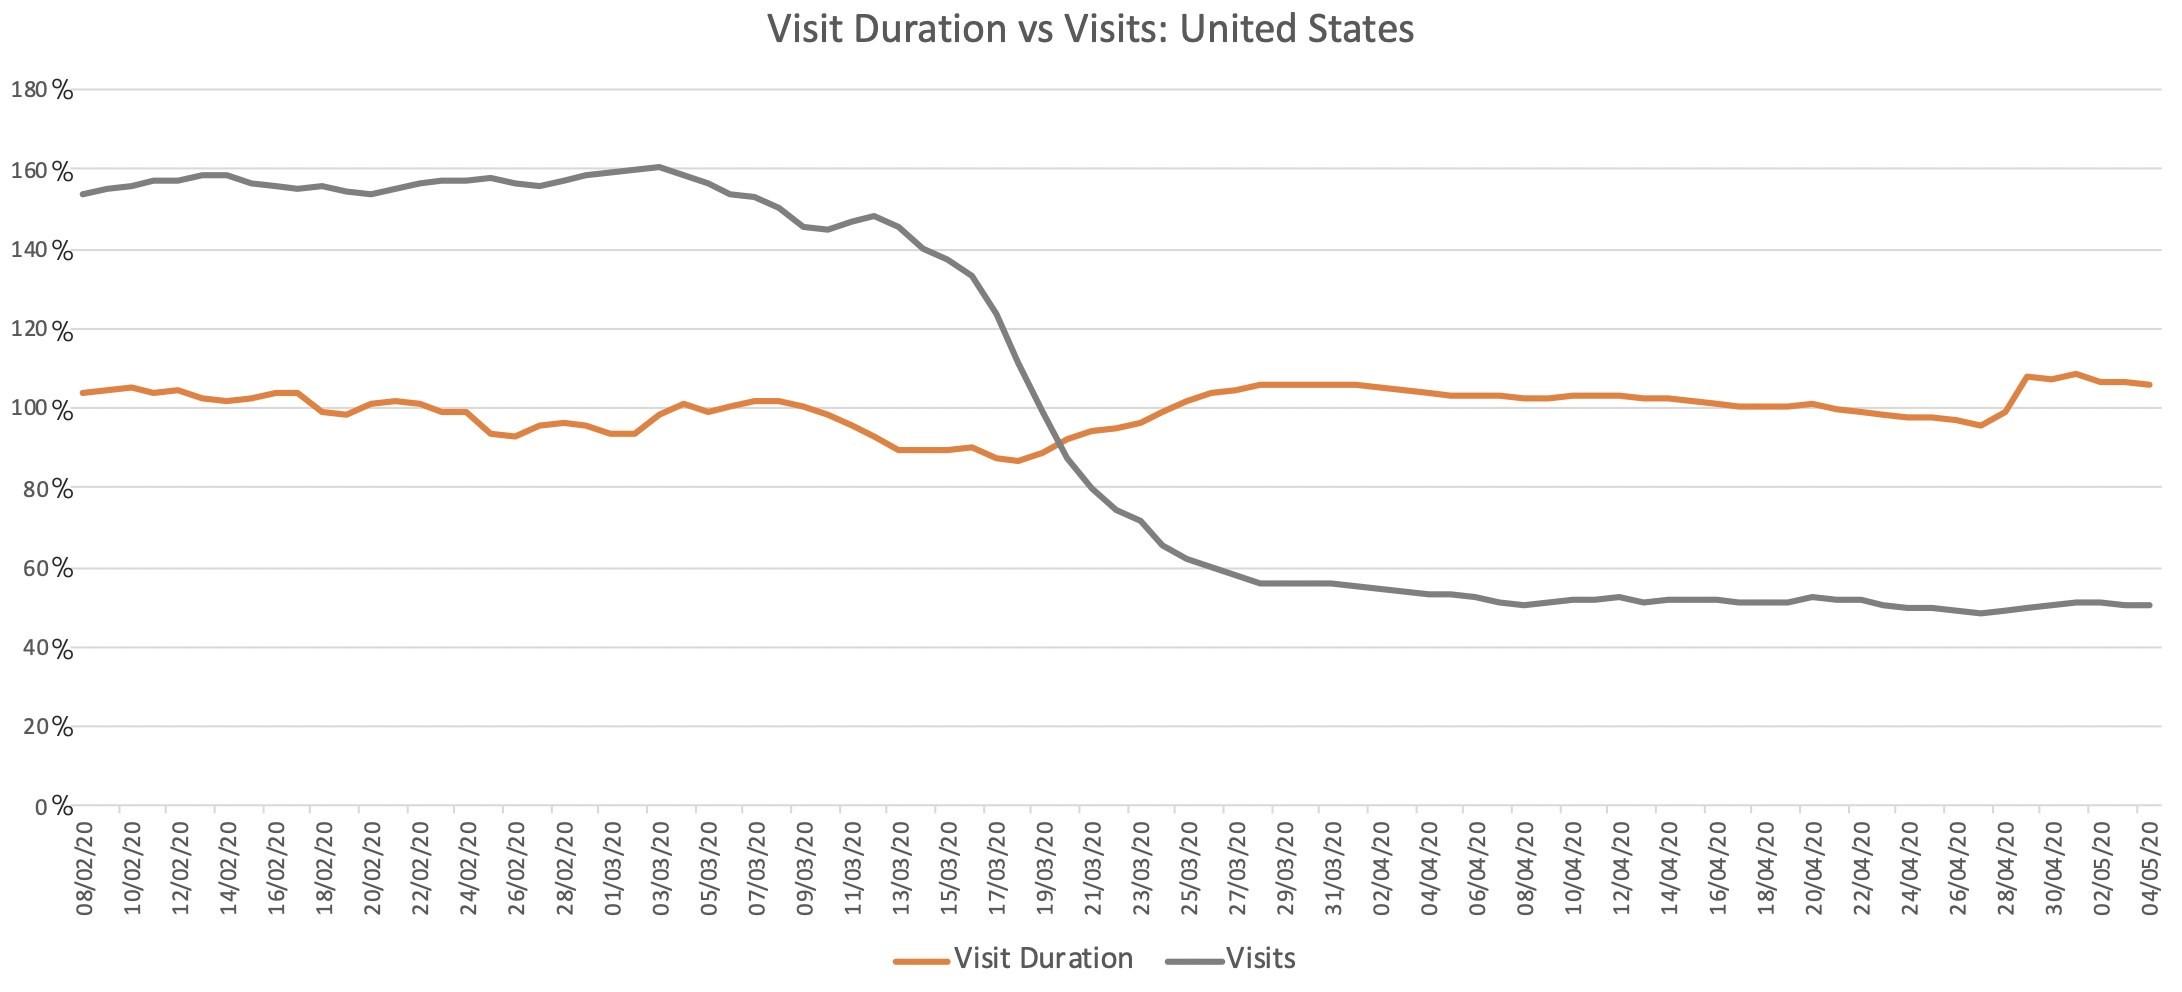 Visit Duration vs Visits: US